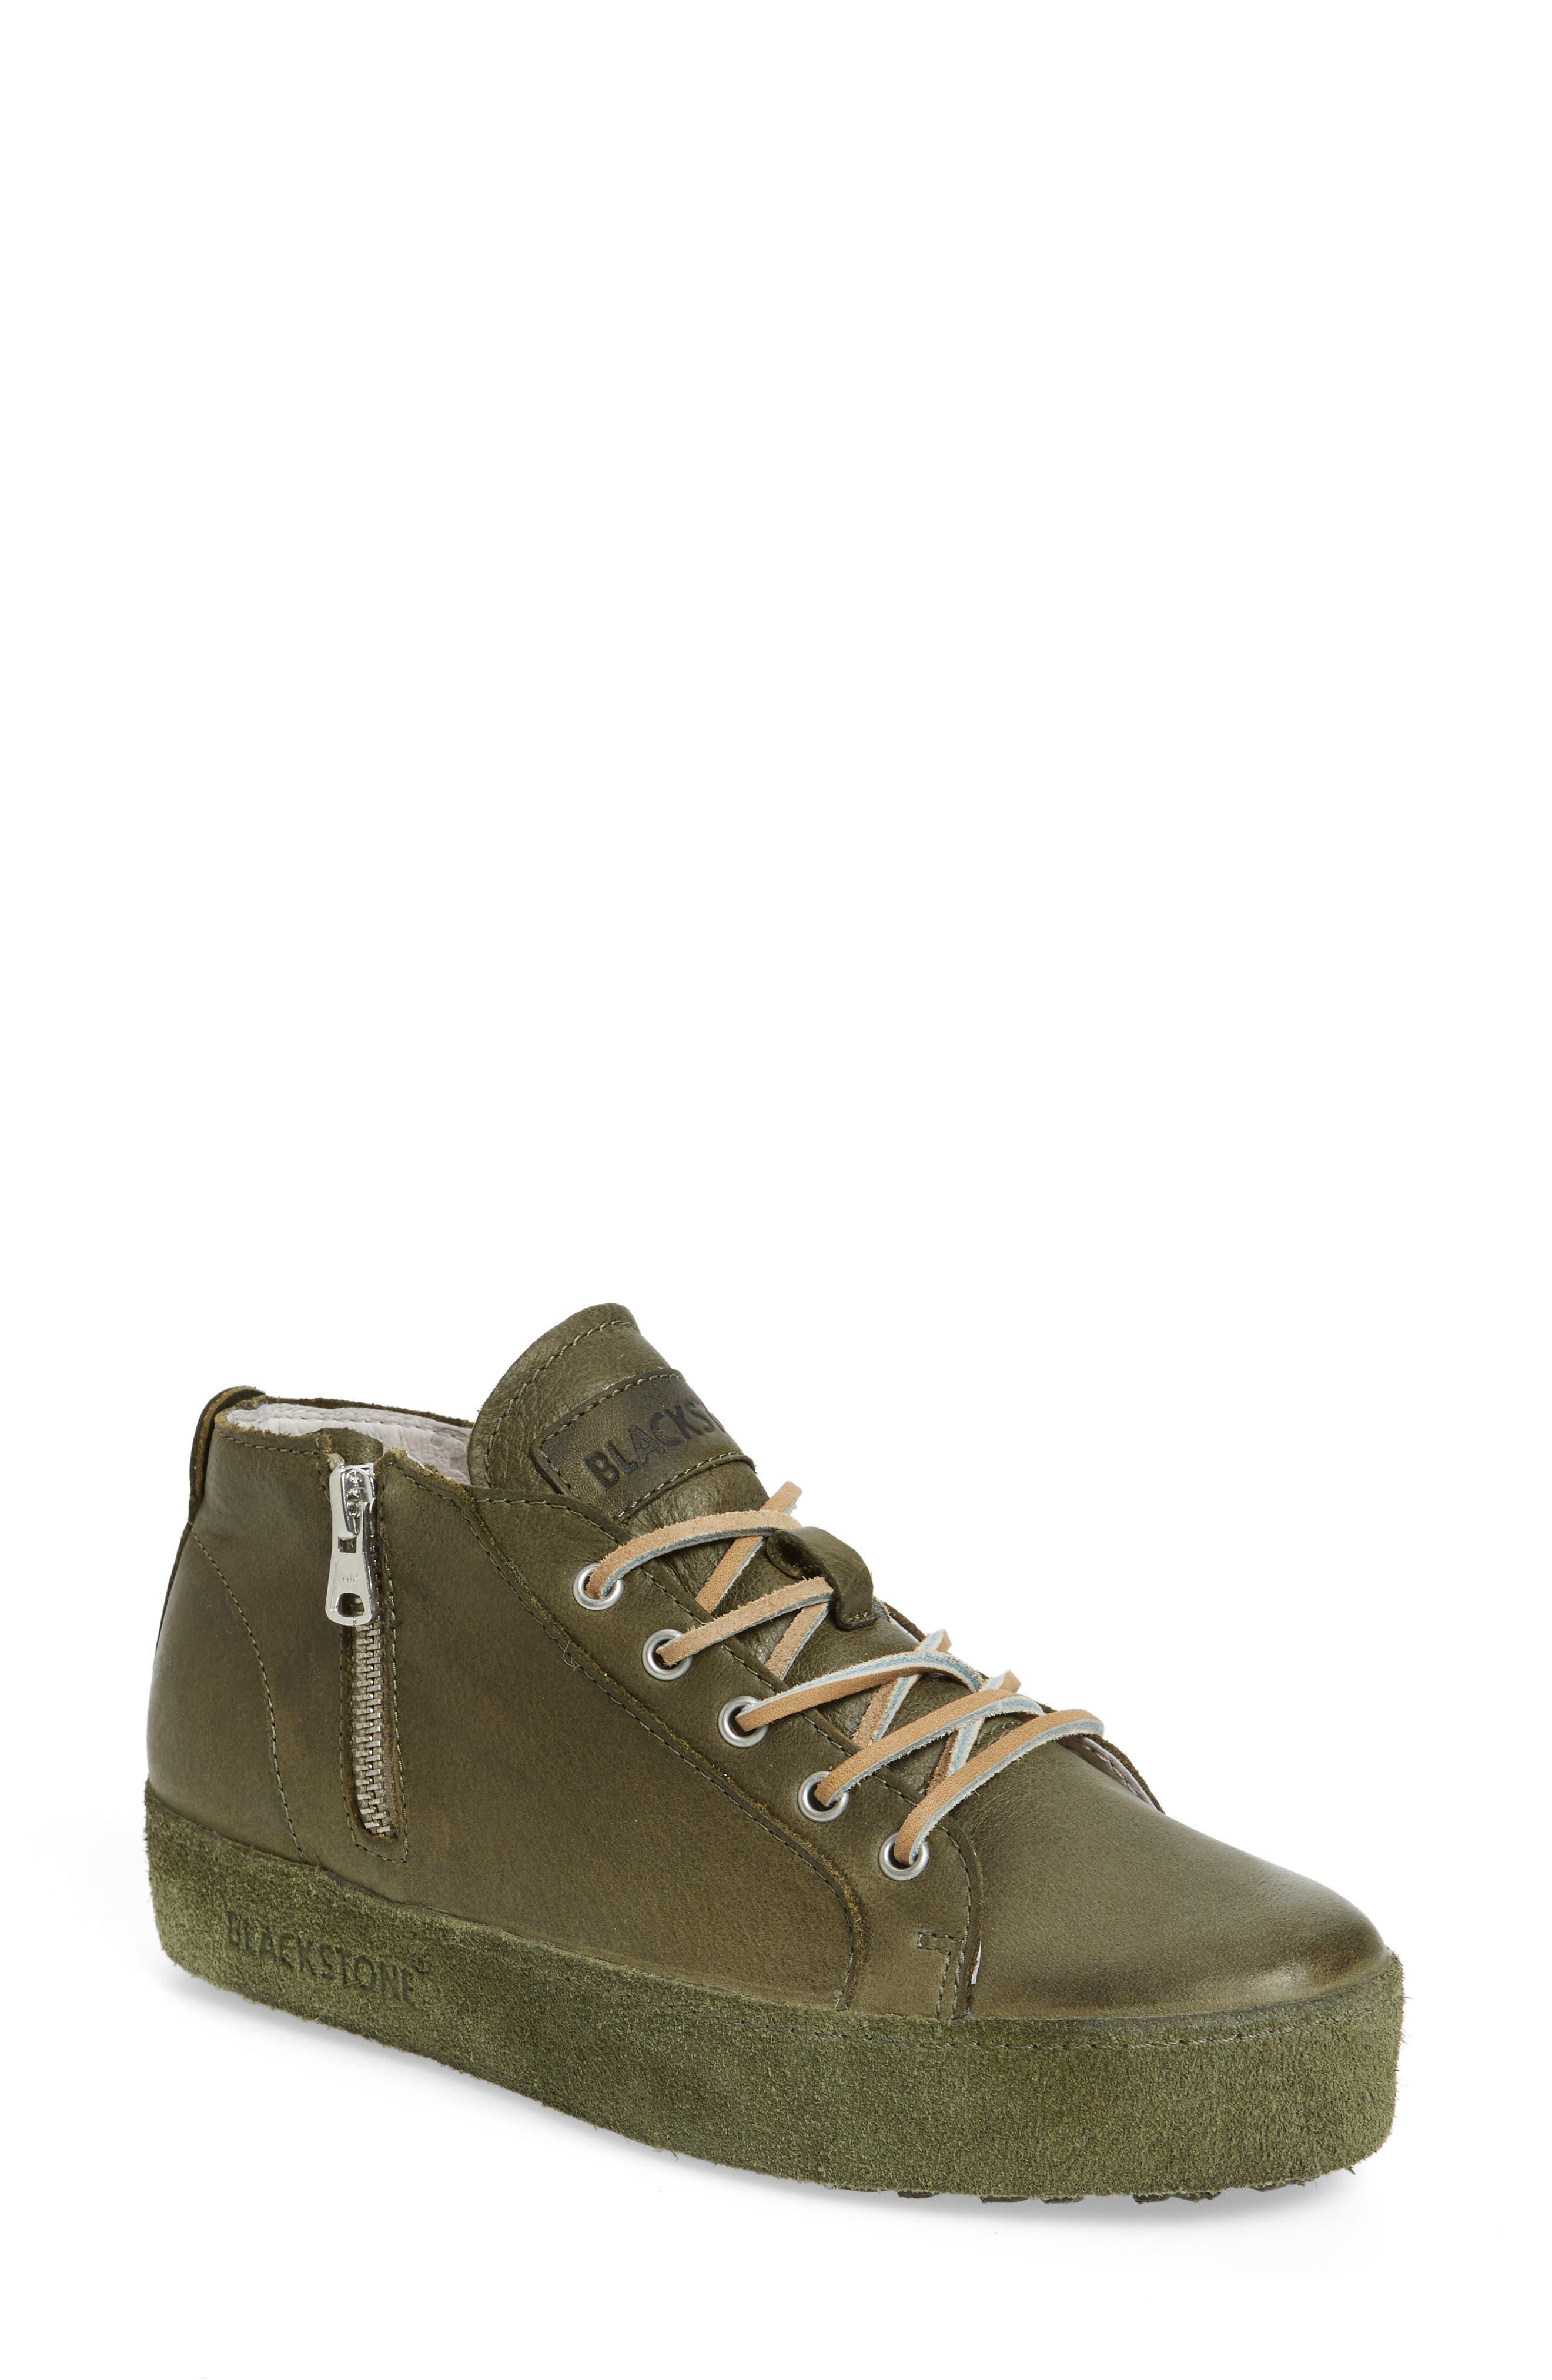 NL37 Midi Platform Sneaker,                         Main,                         color, OLIVE LEATHER